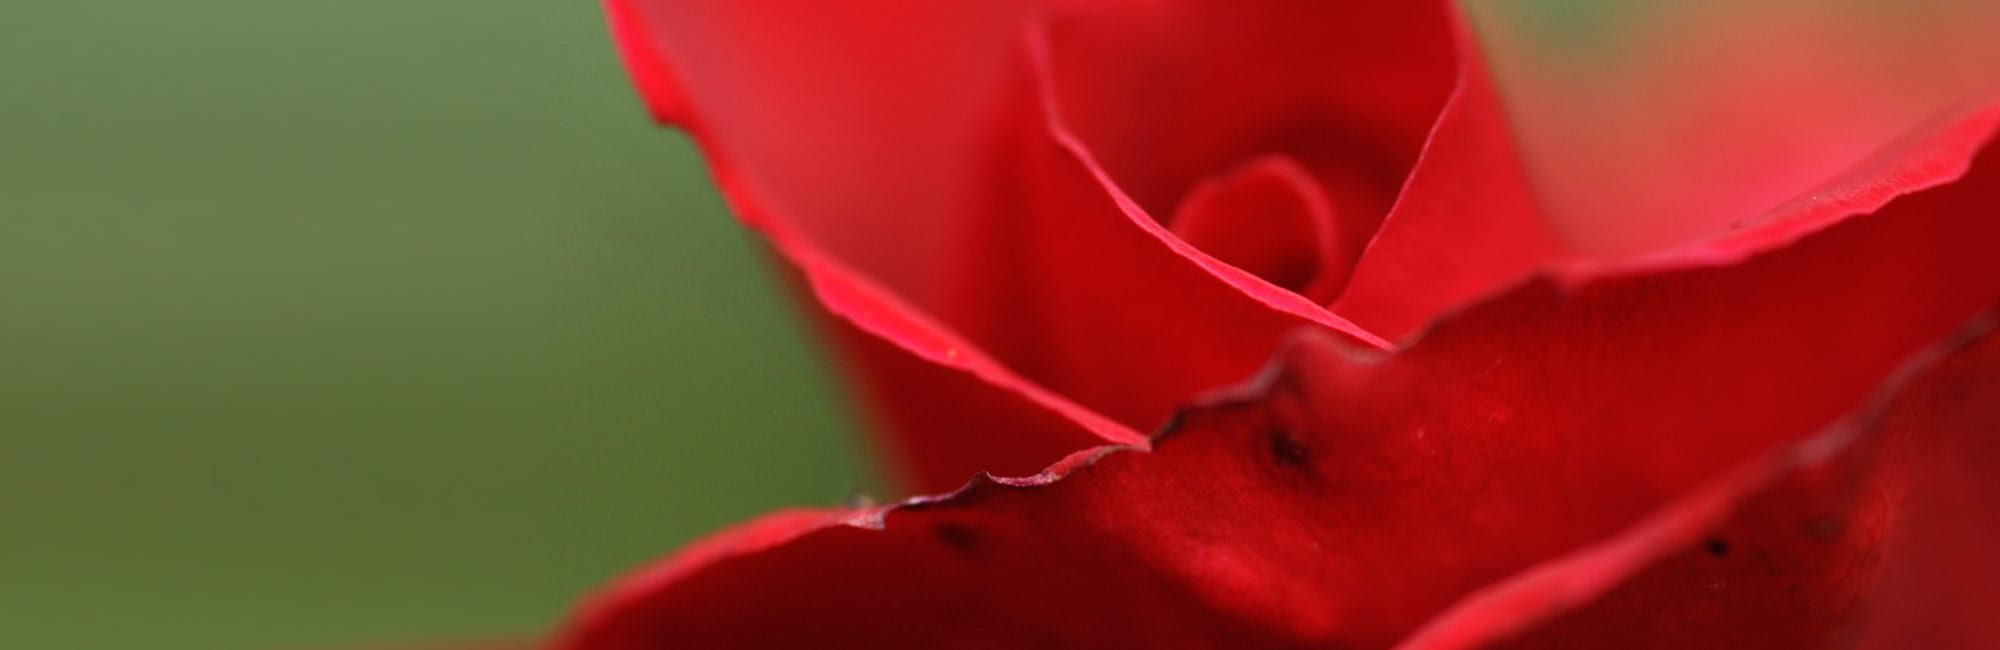 03-Rose-Natur-Naturheilpraxis-Margret-Madejsky-Muenchen